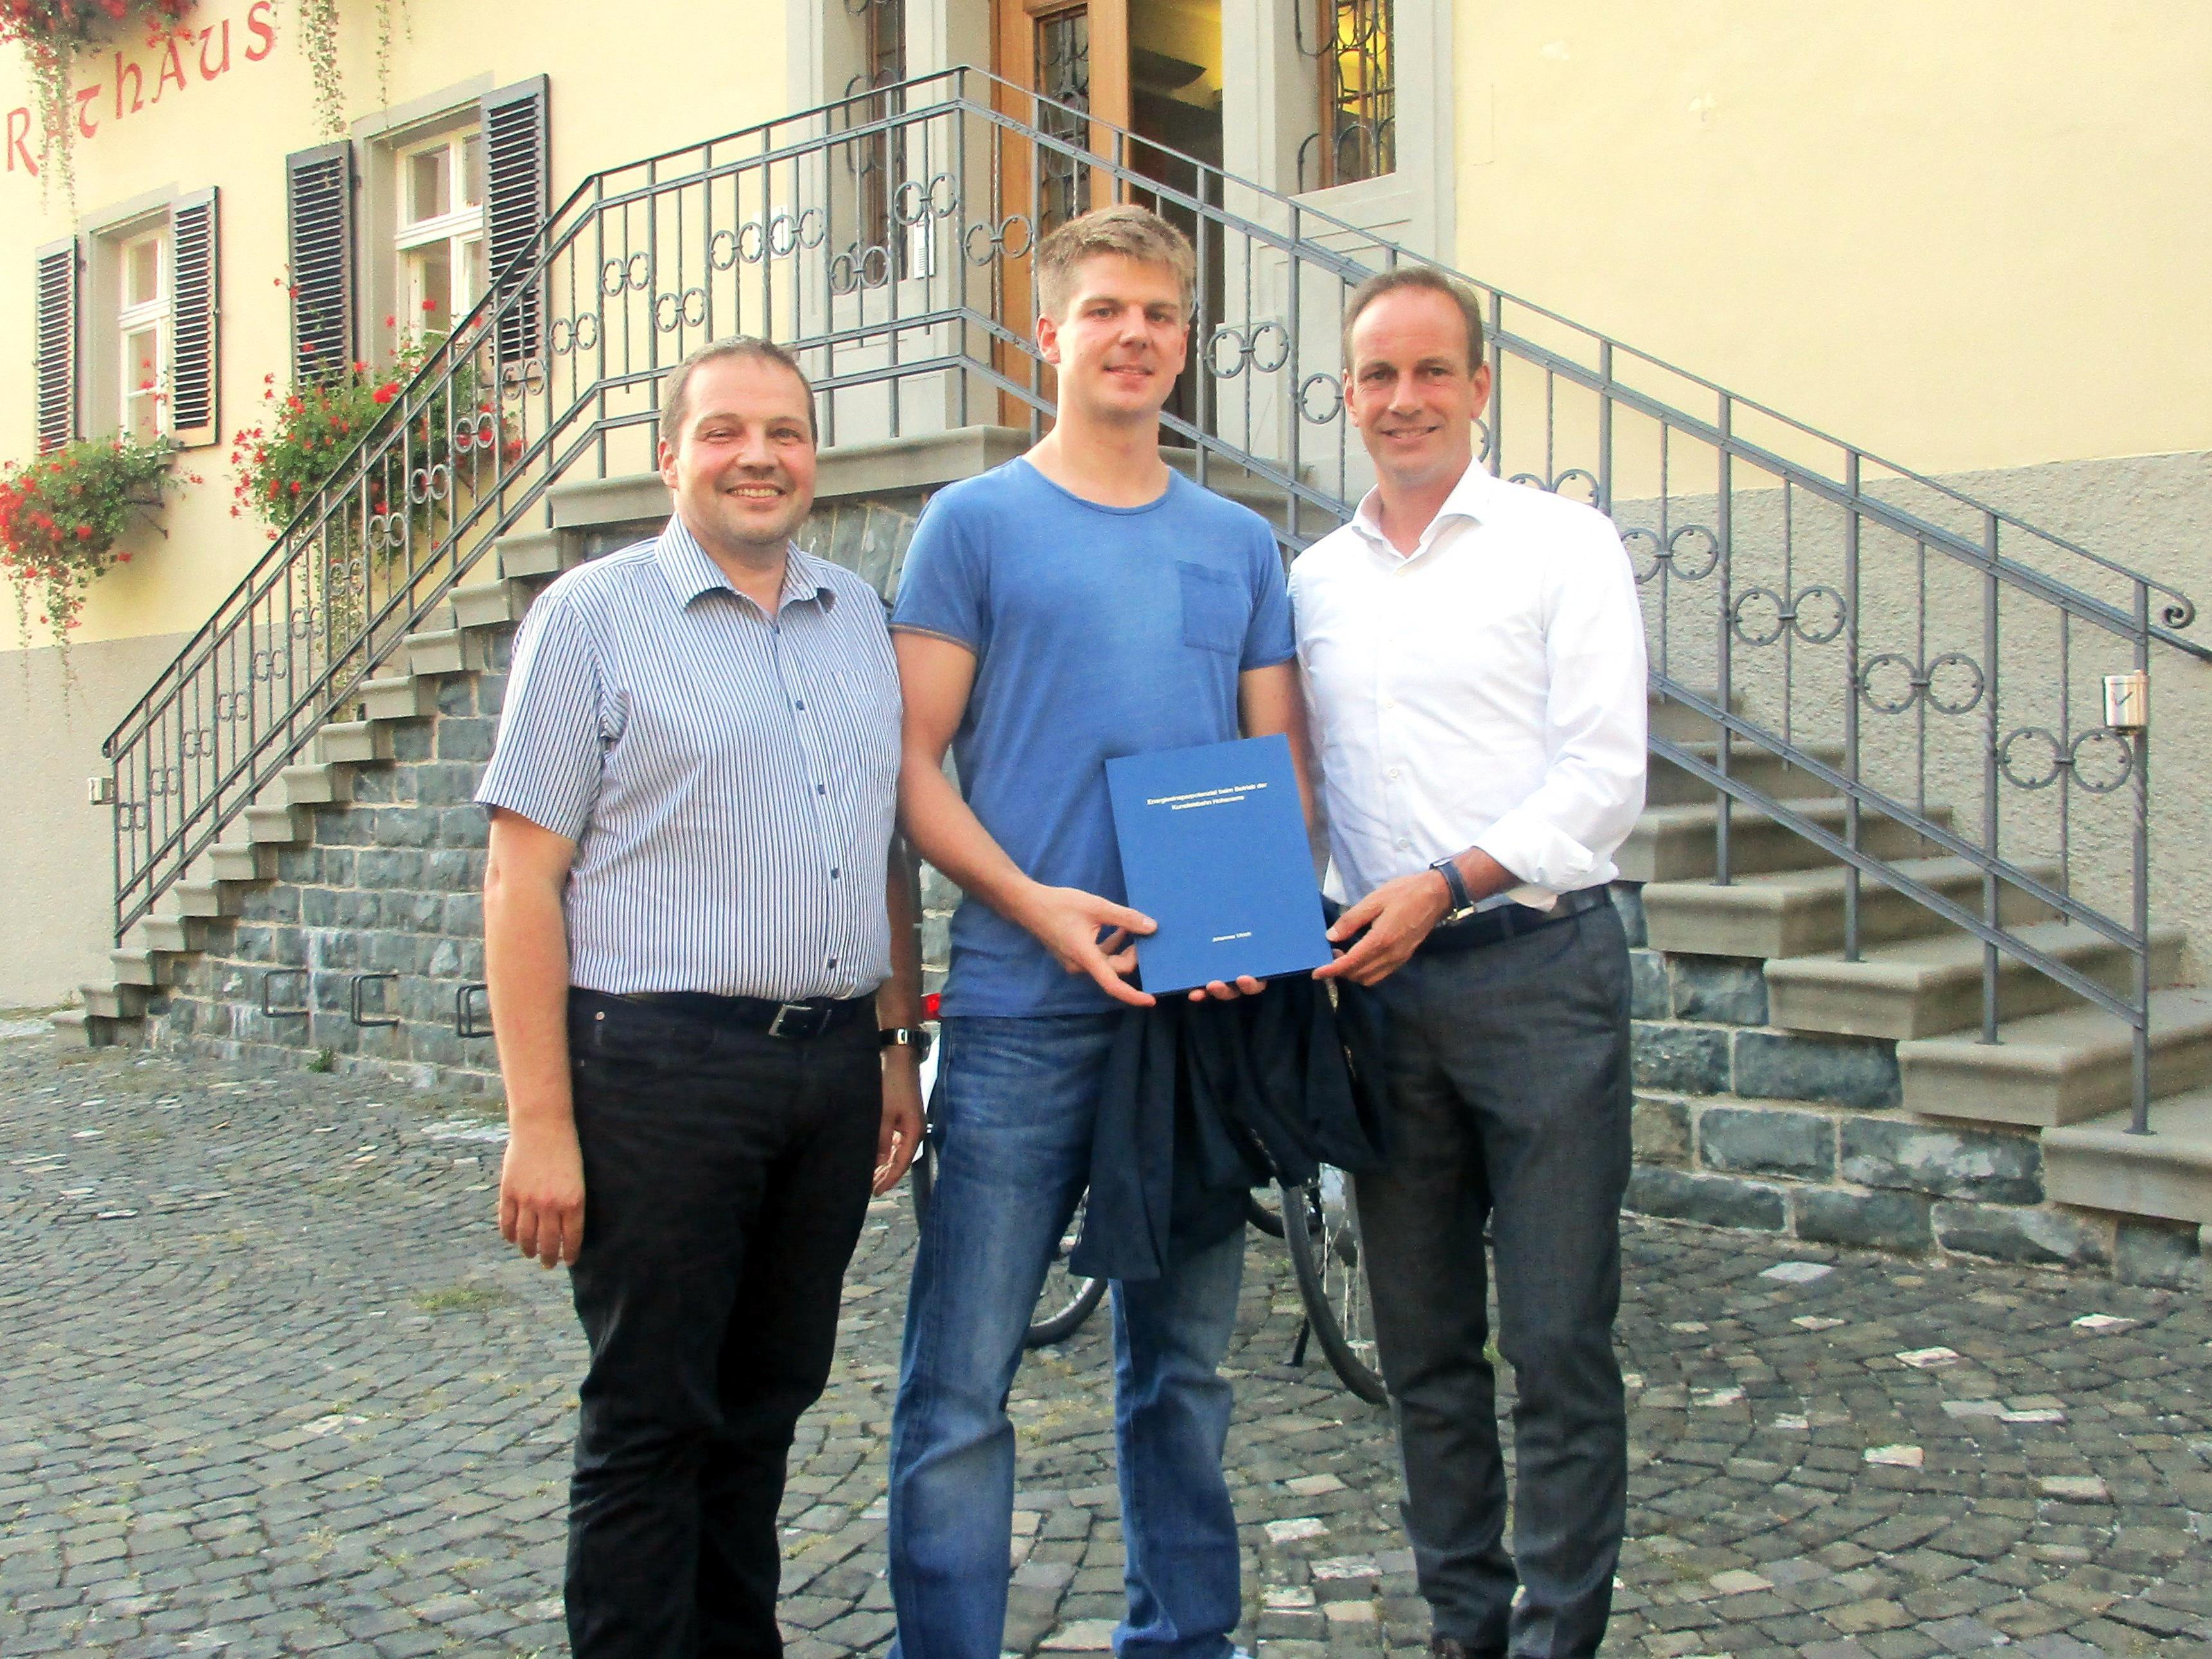 v. l. Umweltstadtrat Günter Mathis, Johannes Ulrich, Bürgermeister Dieter Egger